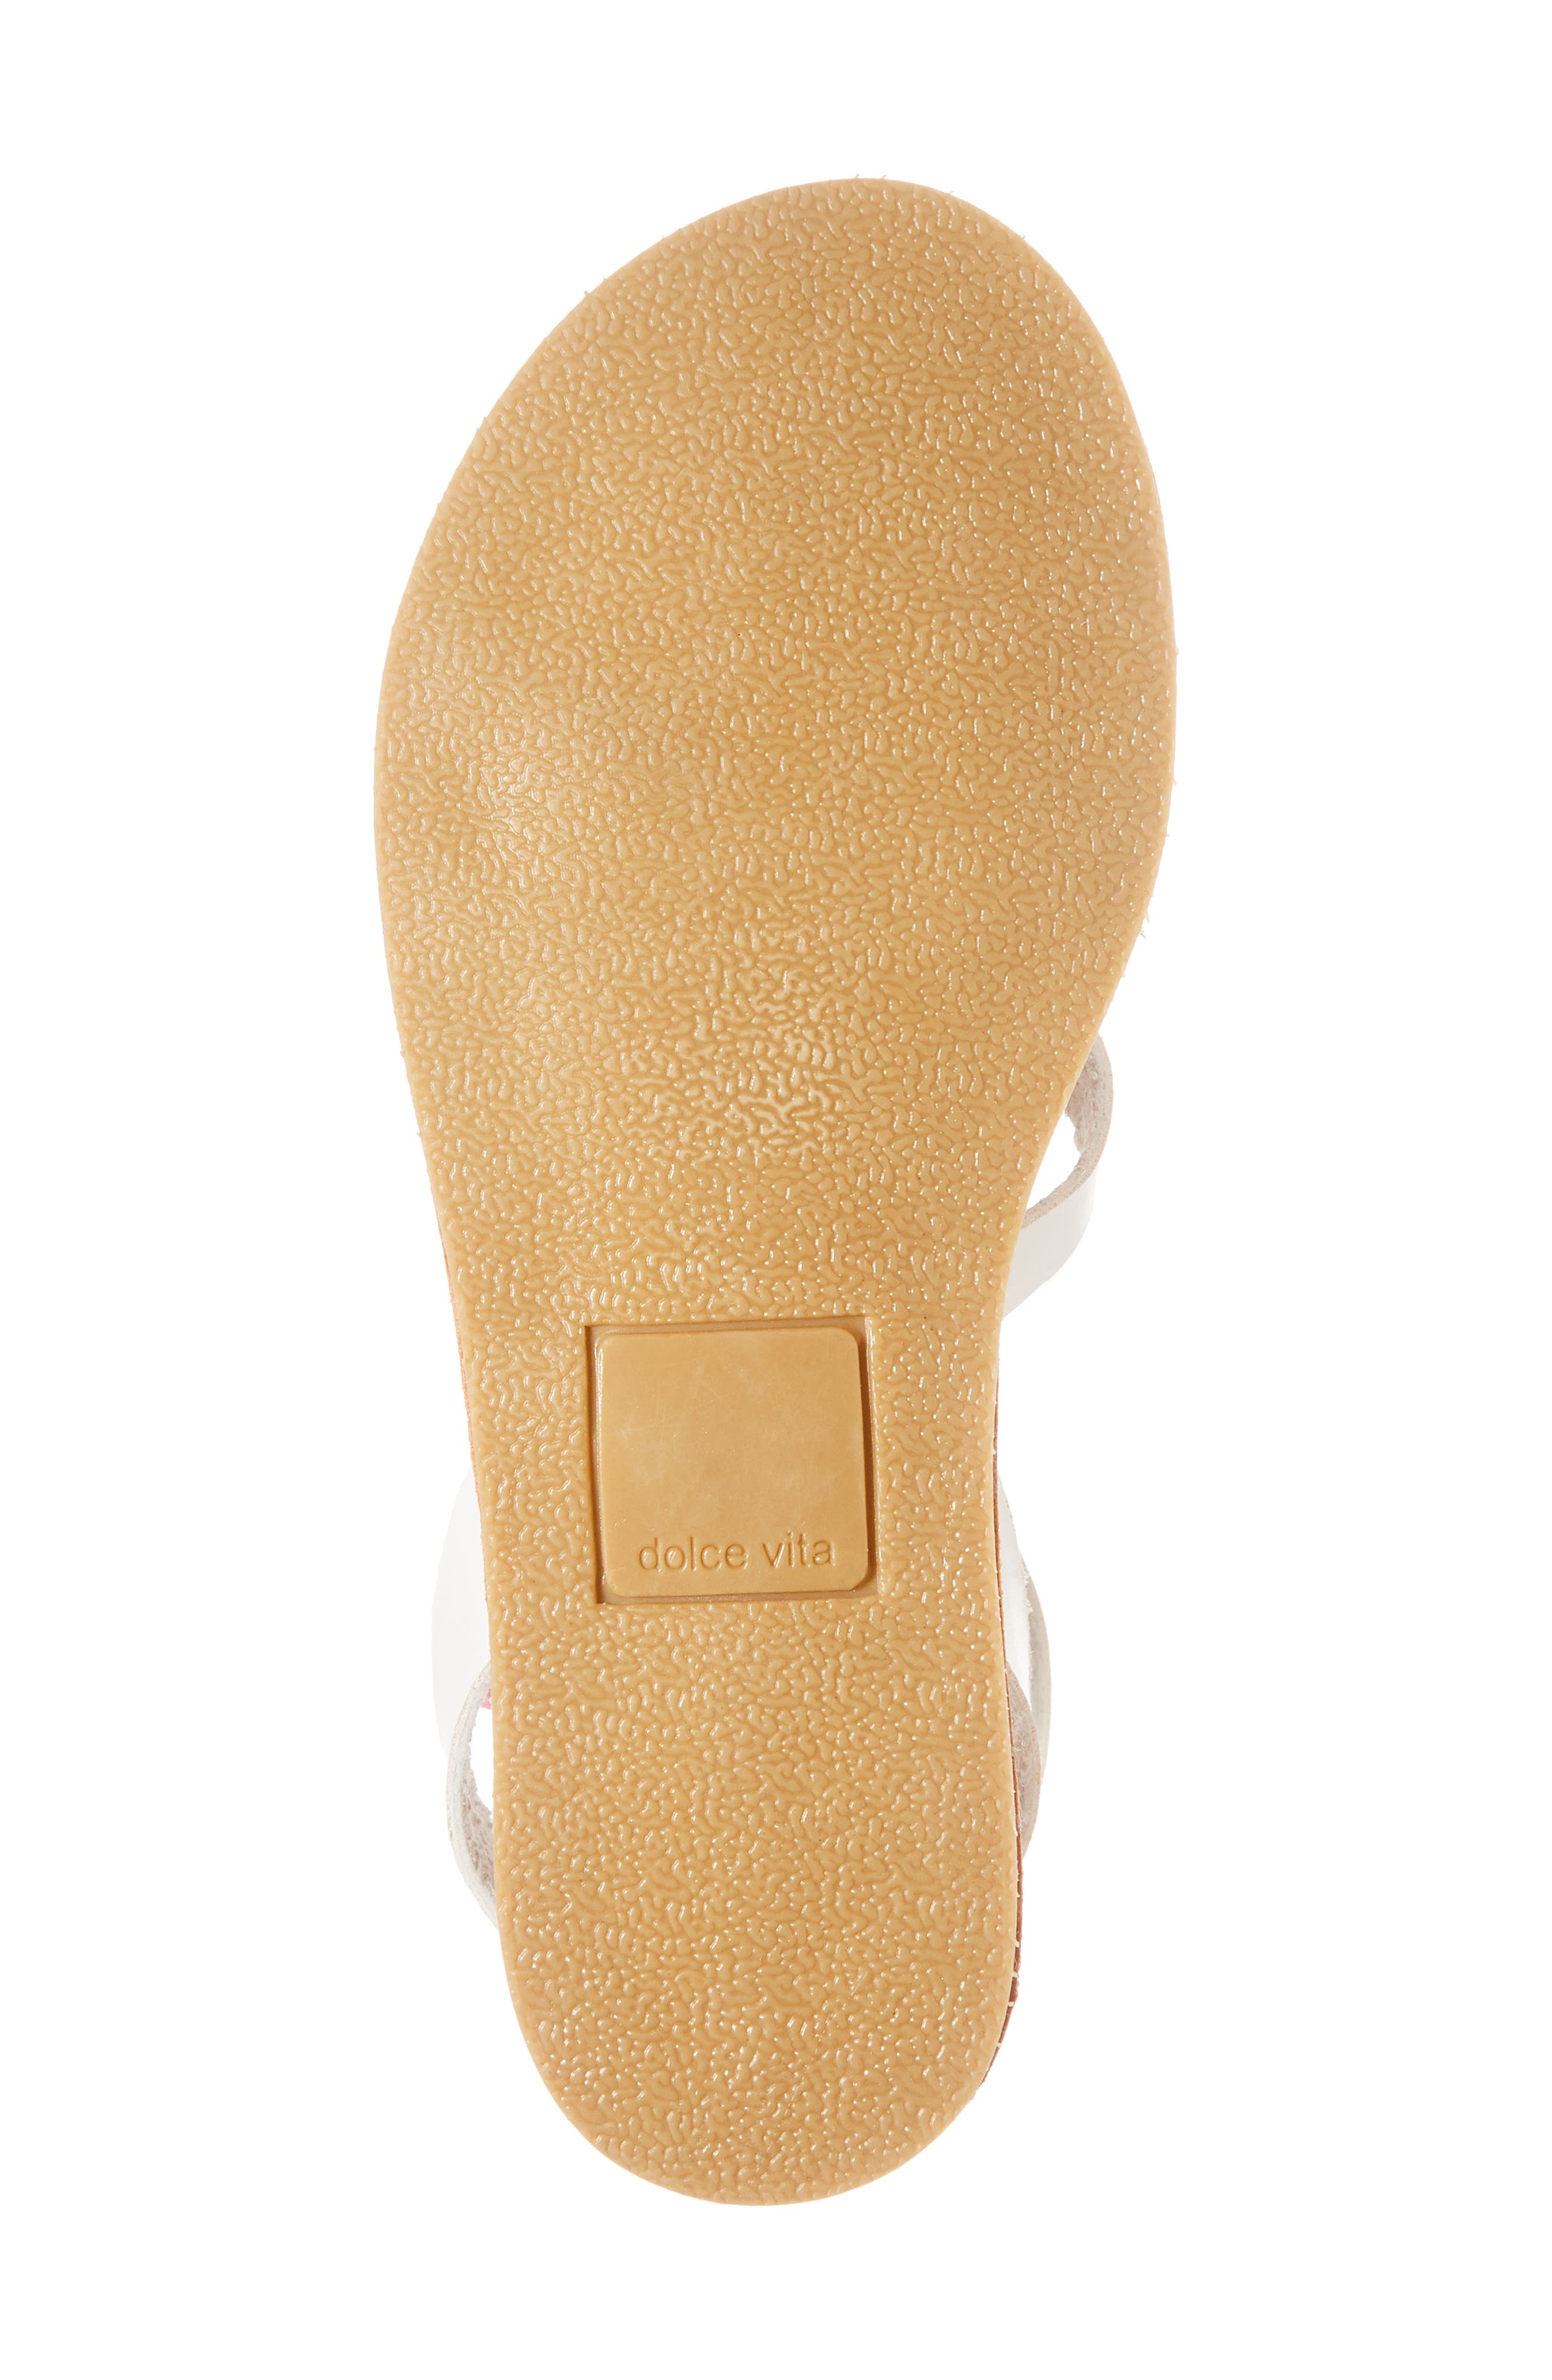 Jaclin Fruit Sequined Sandal,                             Alternate thumbnail 6, color,                             White